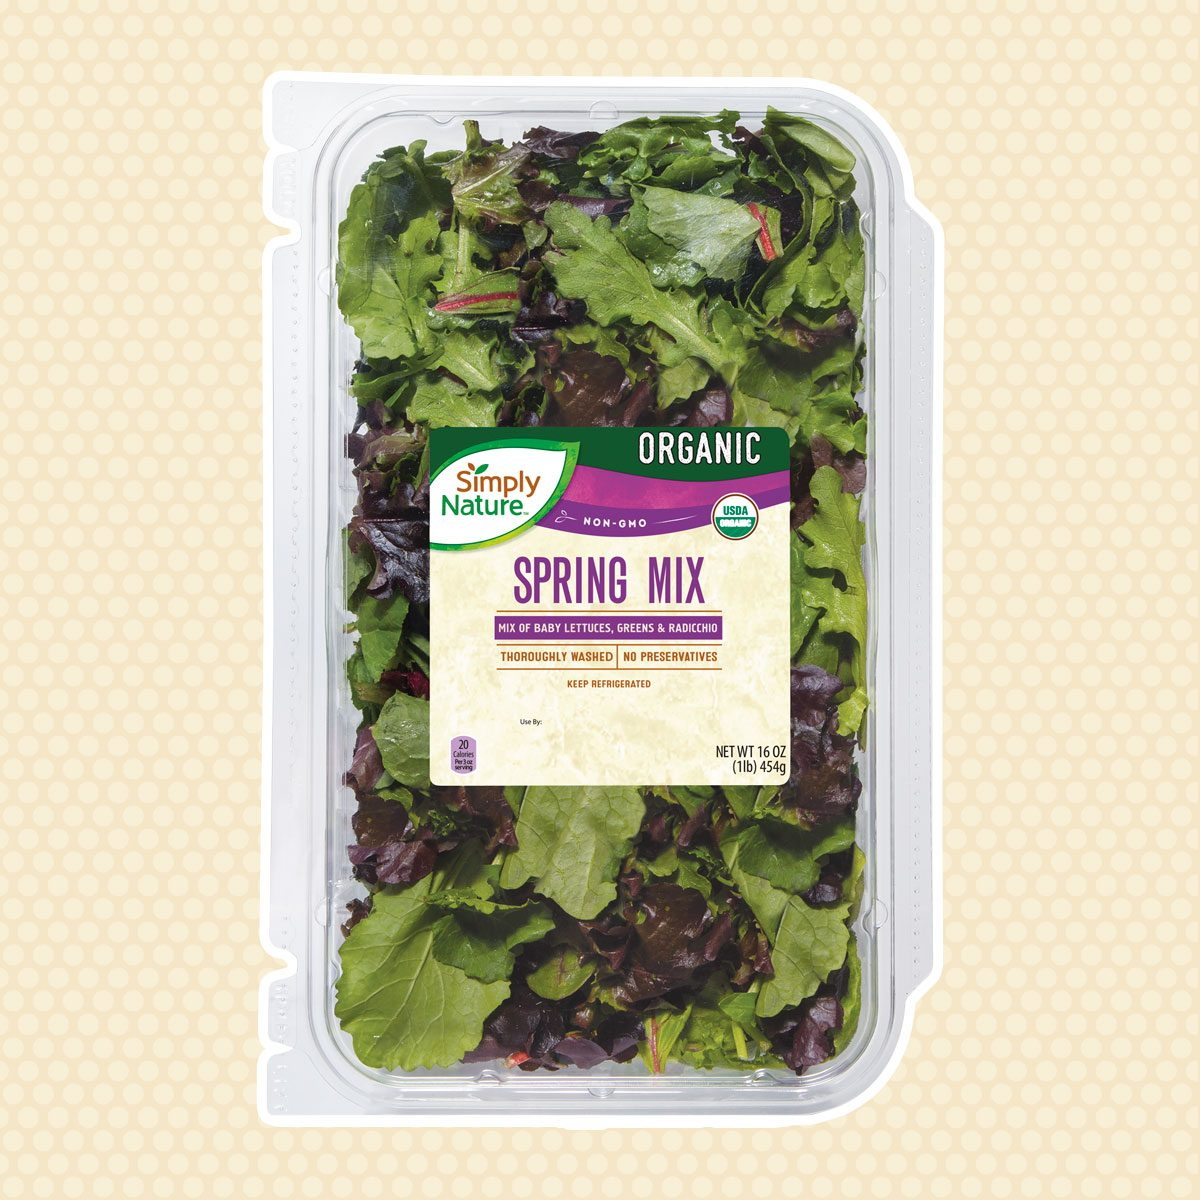 Simply Nature Organic Spring Mix